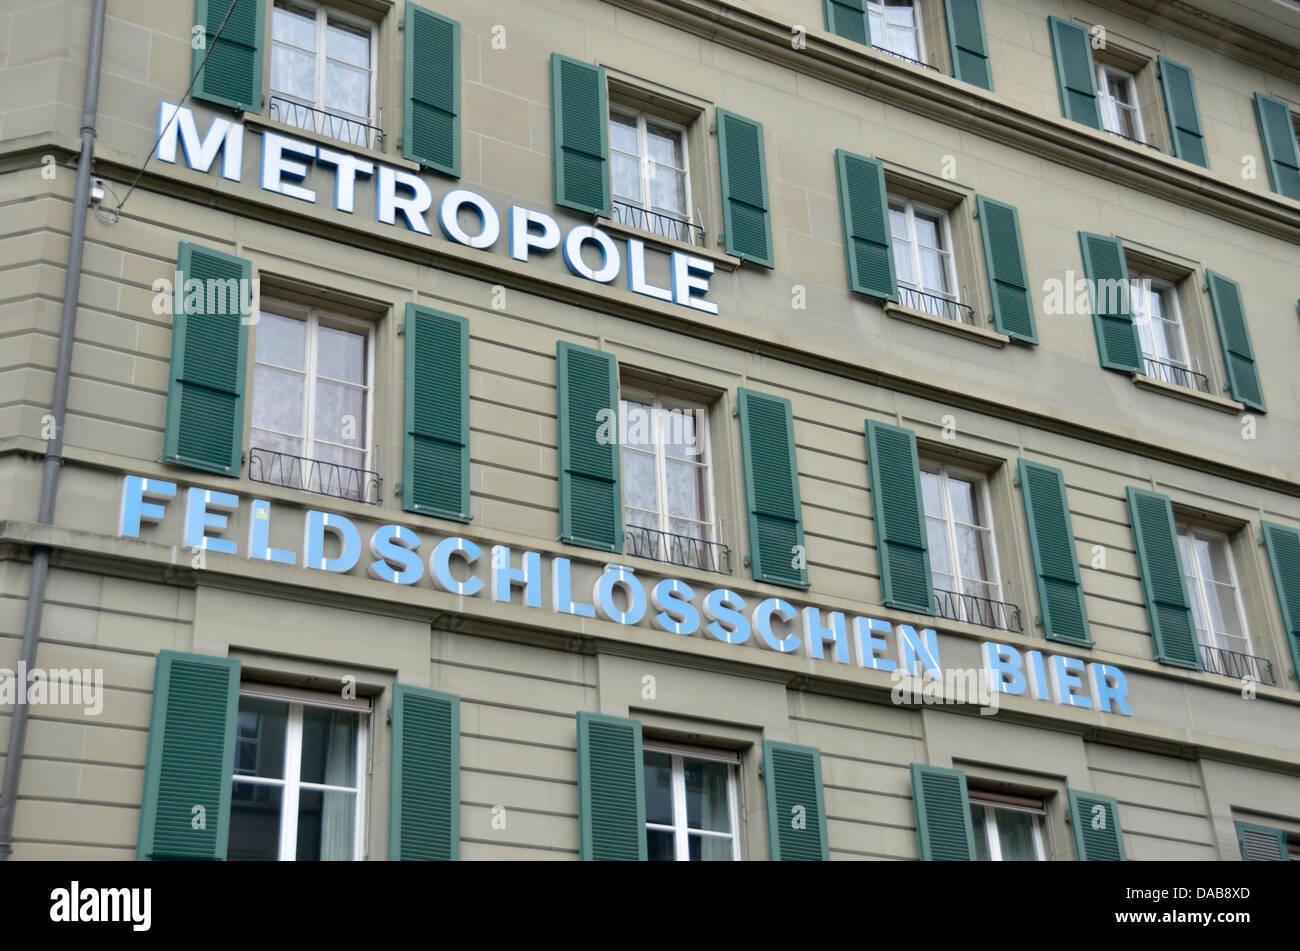 Hotel Metropole, Bern, Switzerland - Stock Image